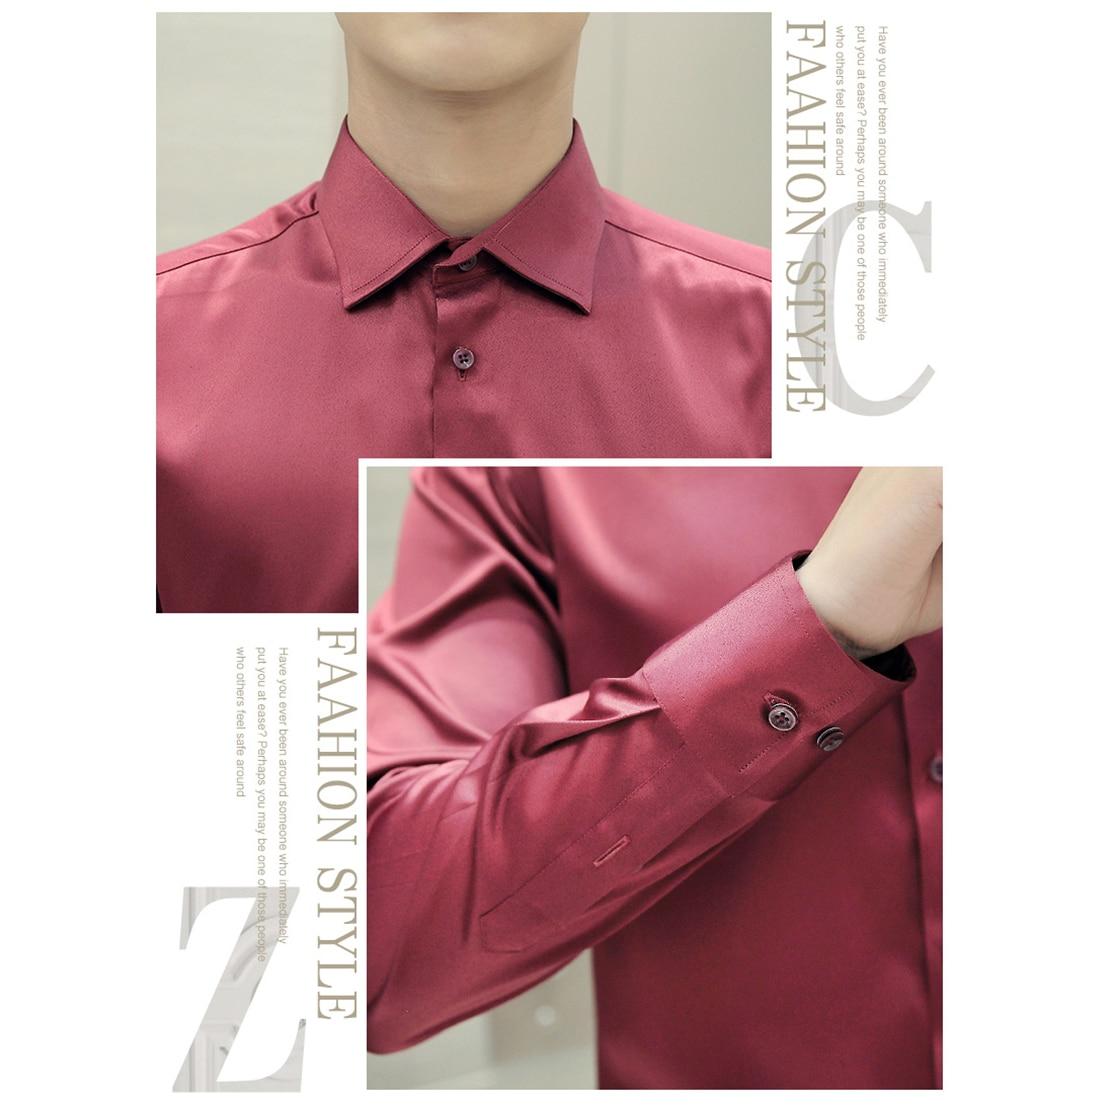 Image 4 - Plus Size 5XL 2019 New Men's Luxury Shirts Wedding Party Dress Long Sleeve Shirt Silk Tuxedo Shirt Men Mercerized Cotton Shirt-in Tuxedo Shirts from Men's Clothing